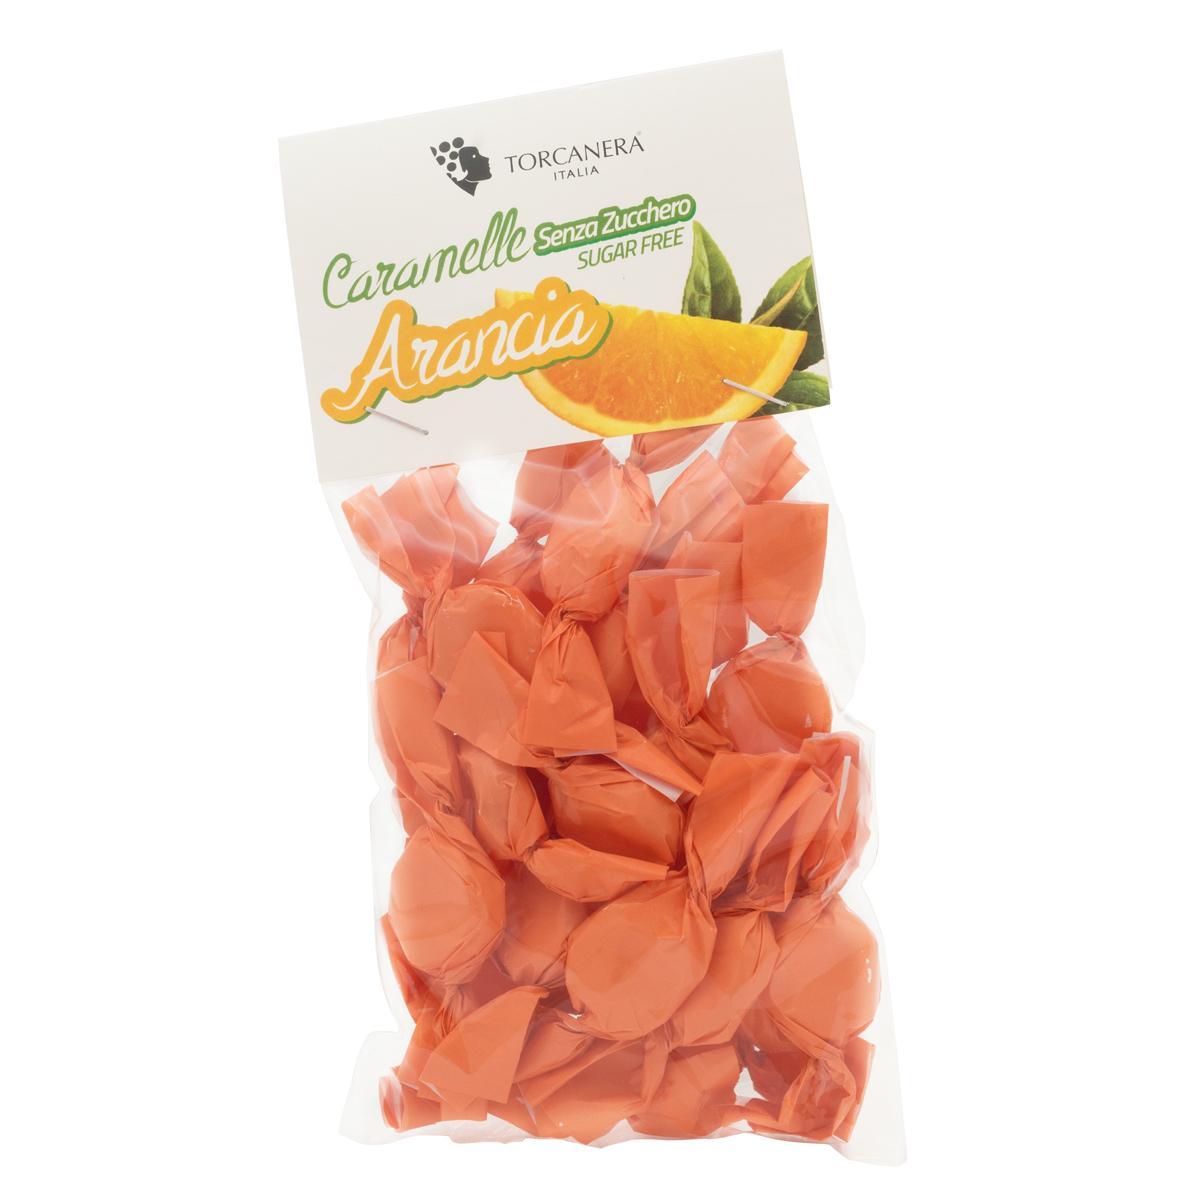 Caramelle all'Arancia Senza Zucchero